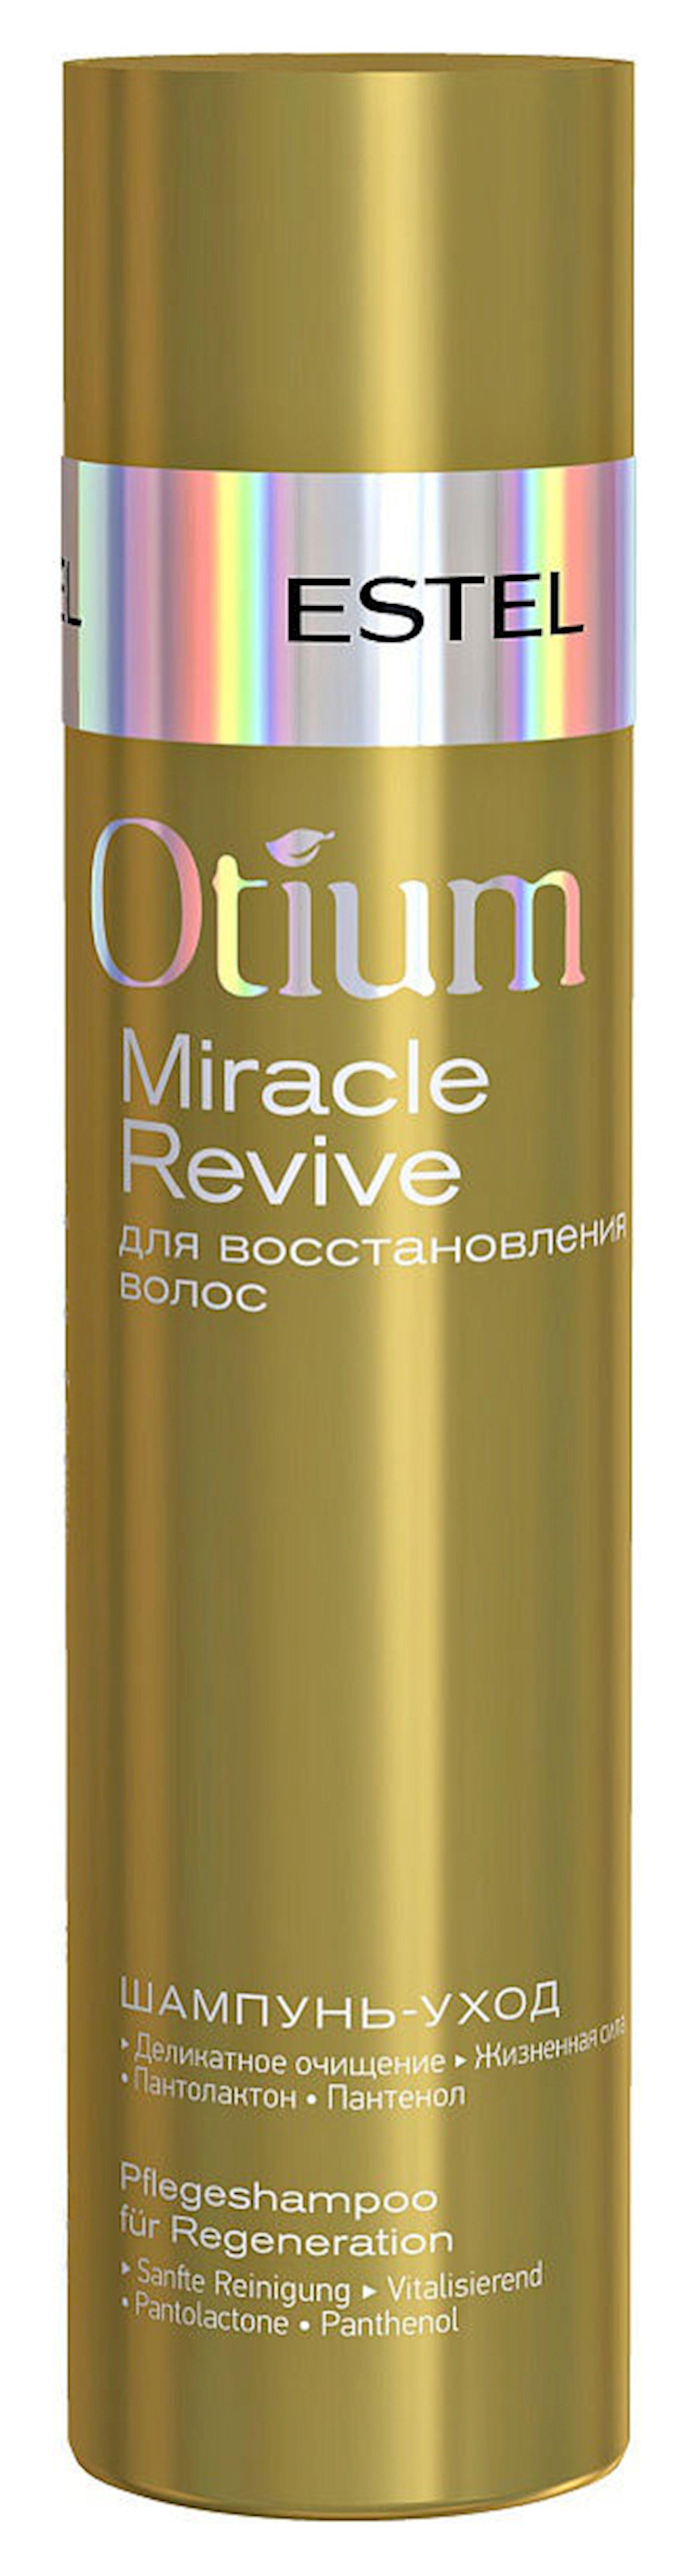 Şampun Estel Professional Otium Miracle Revive Shampoo bərpaedici 250 ml